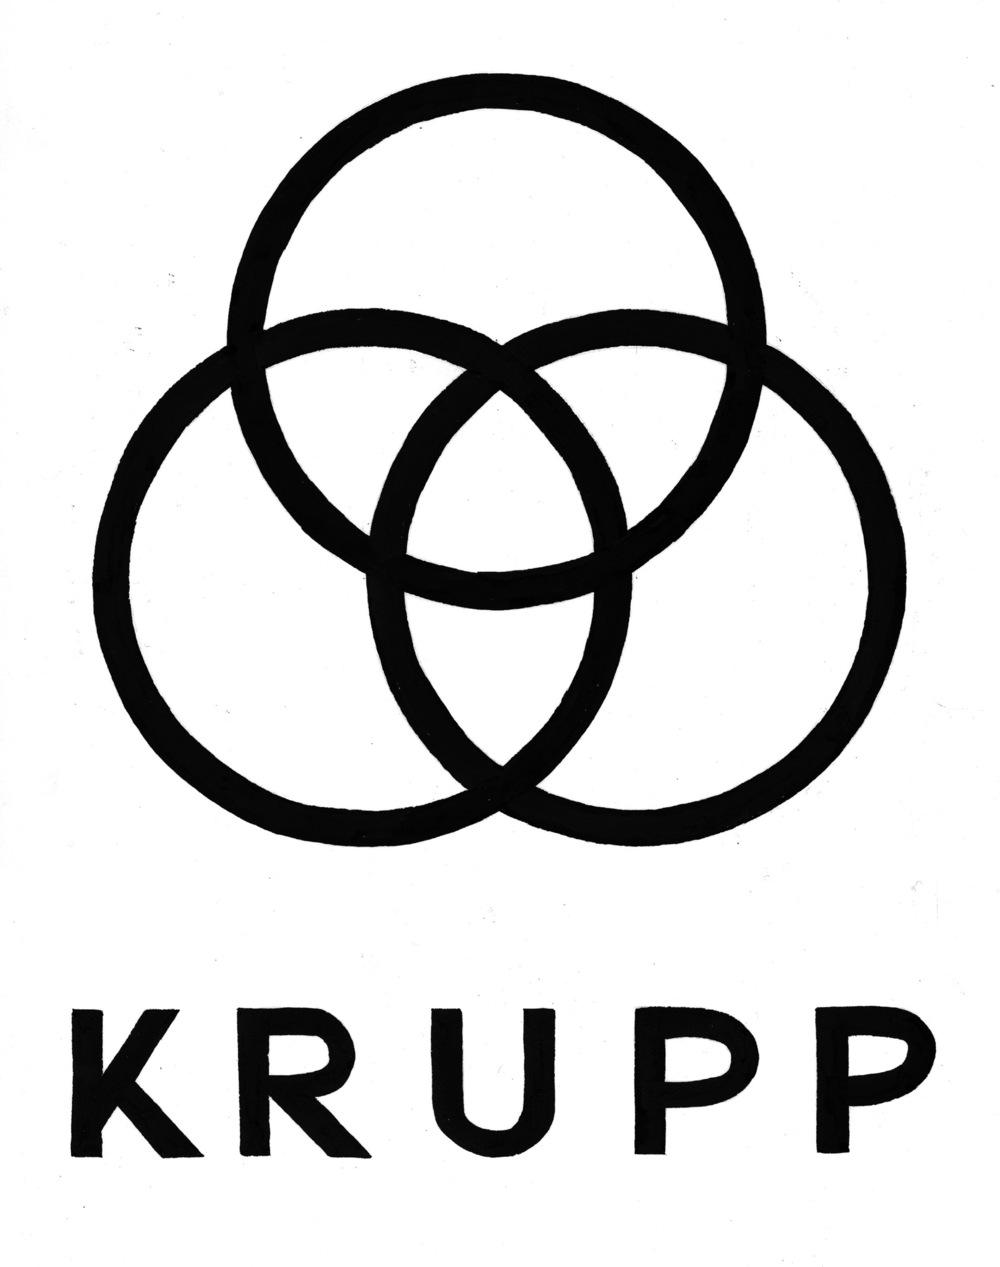 Fernando Bryce, Krupp